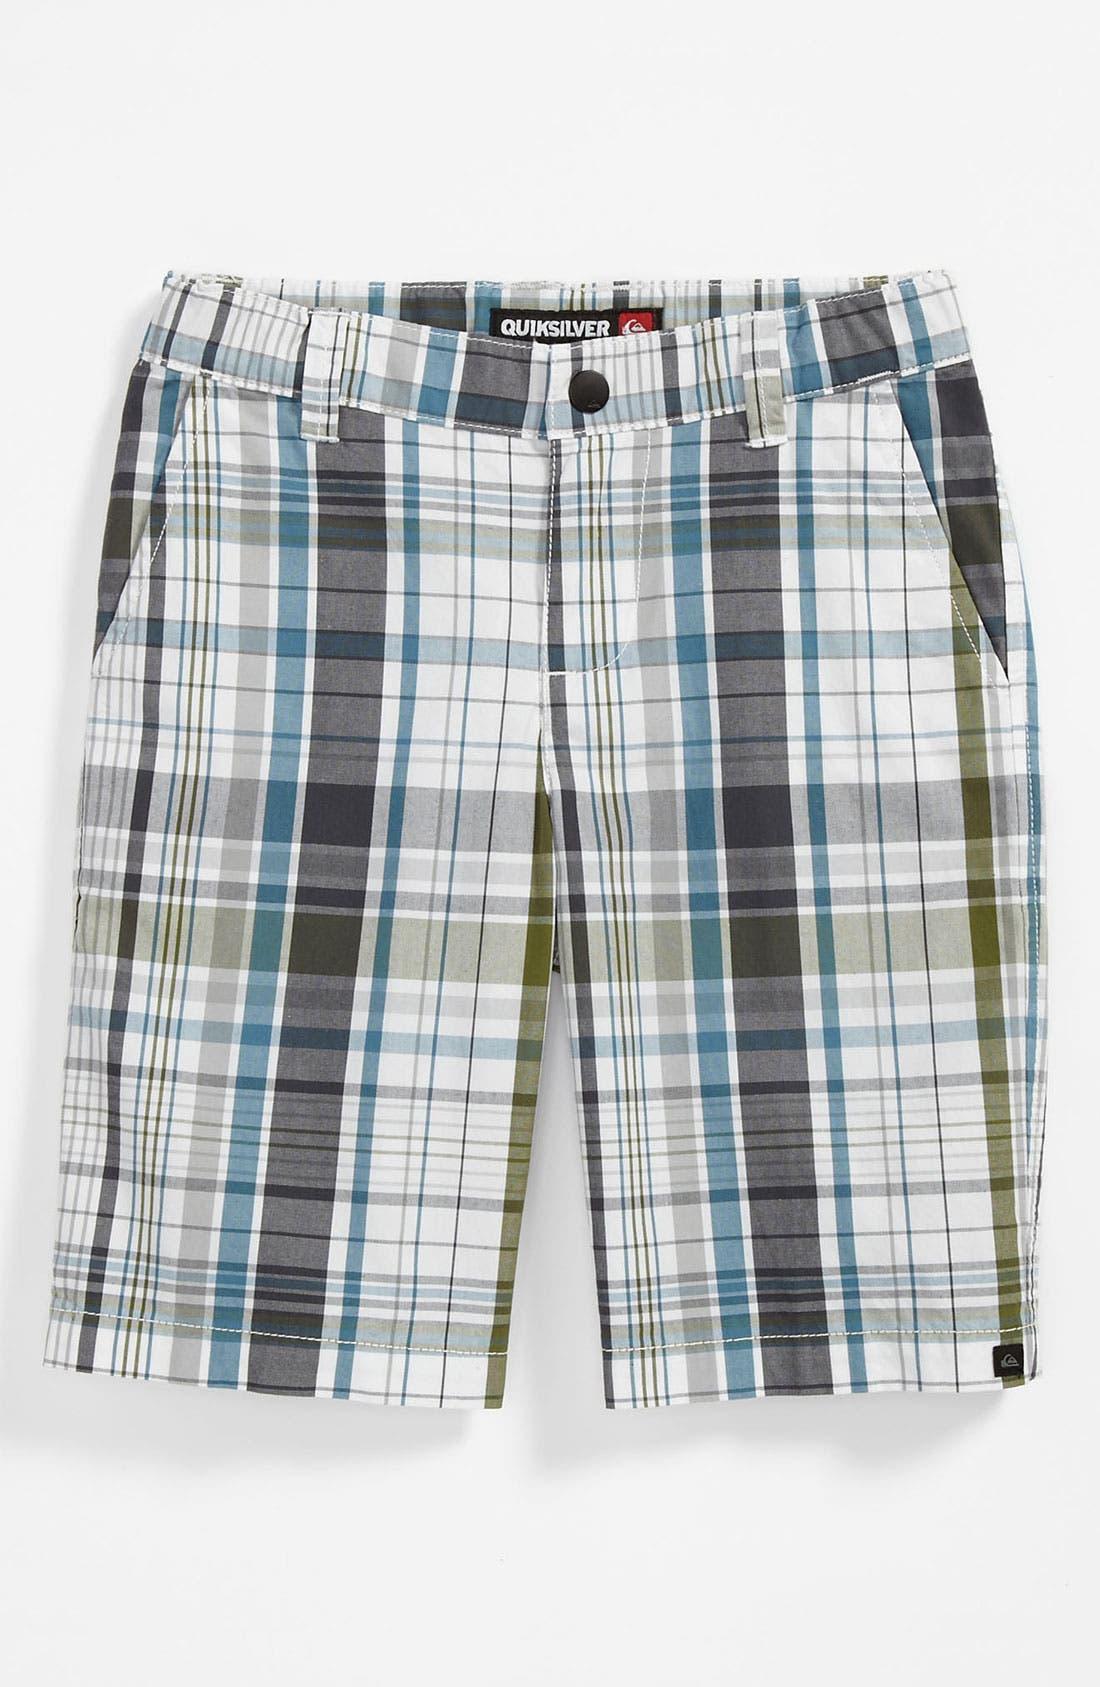 Alternate Image 1 Selected - Quiksilver 'Cordova' Shorts (Little Boys)